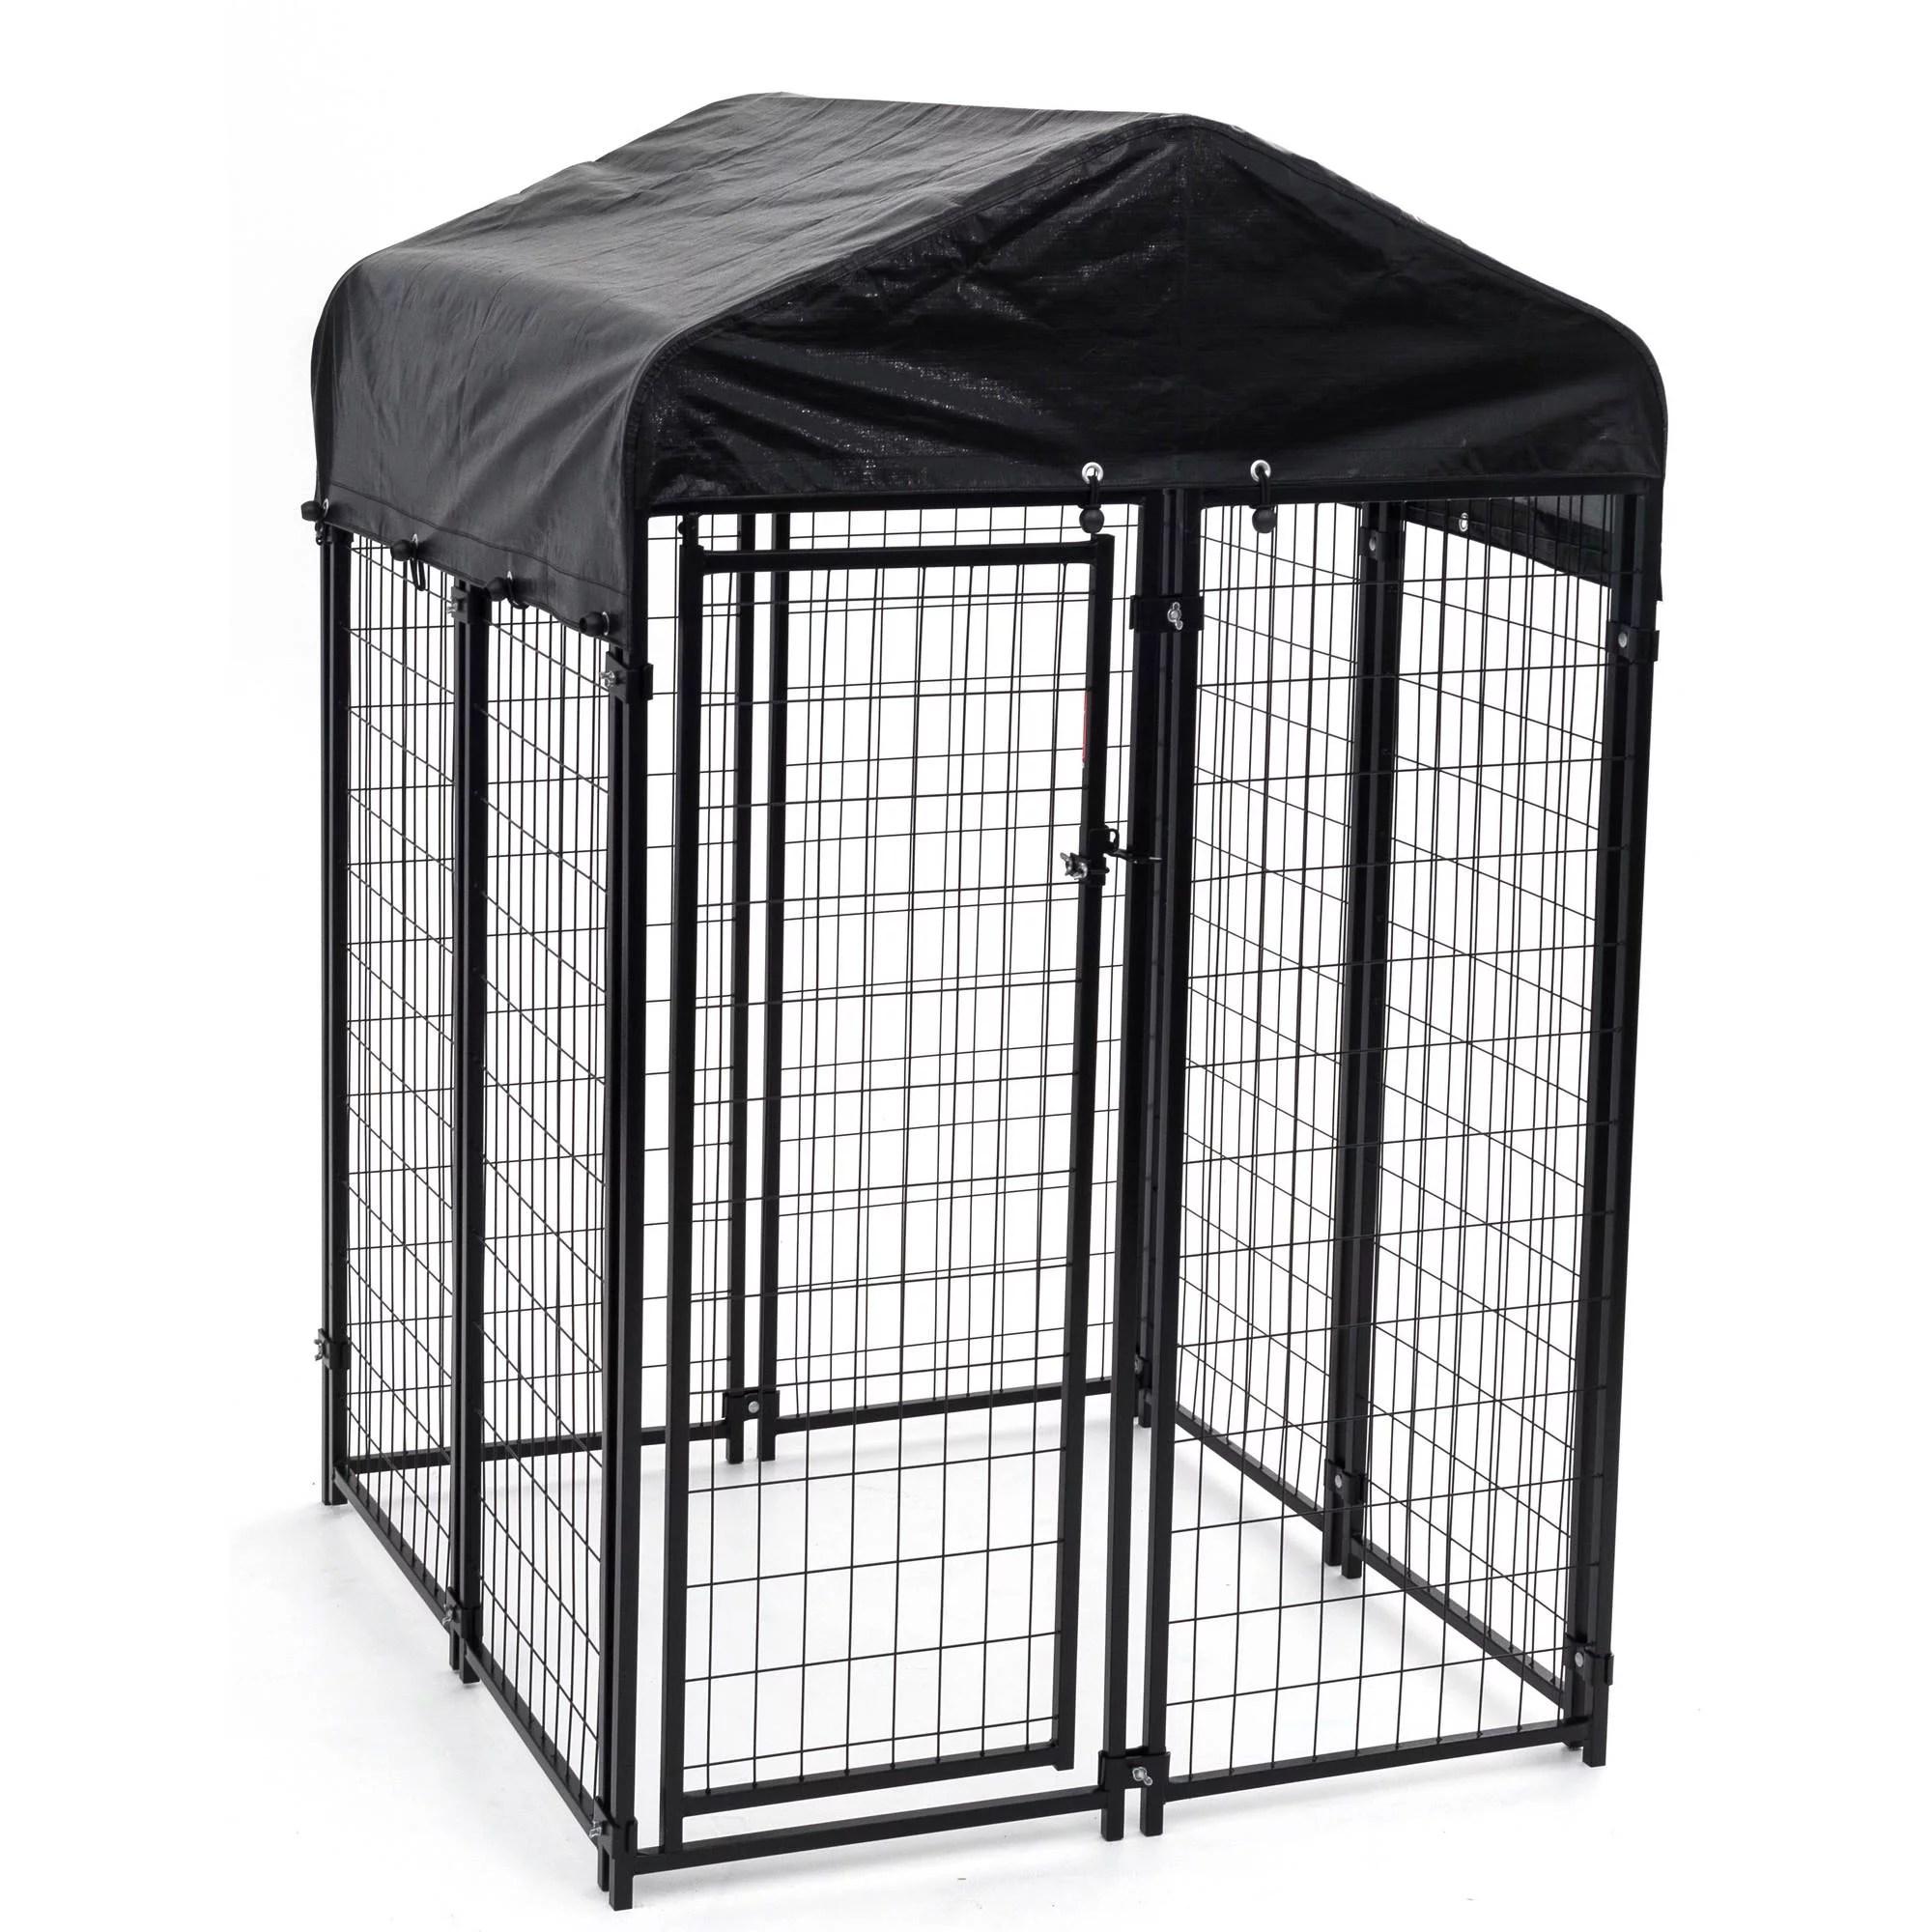 lucky dog uptown welded wire dog kennel w cover 6 h x 4 w x 4 l walmart com